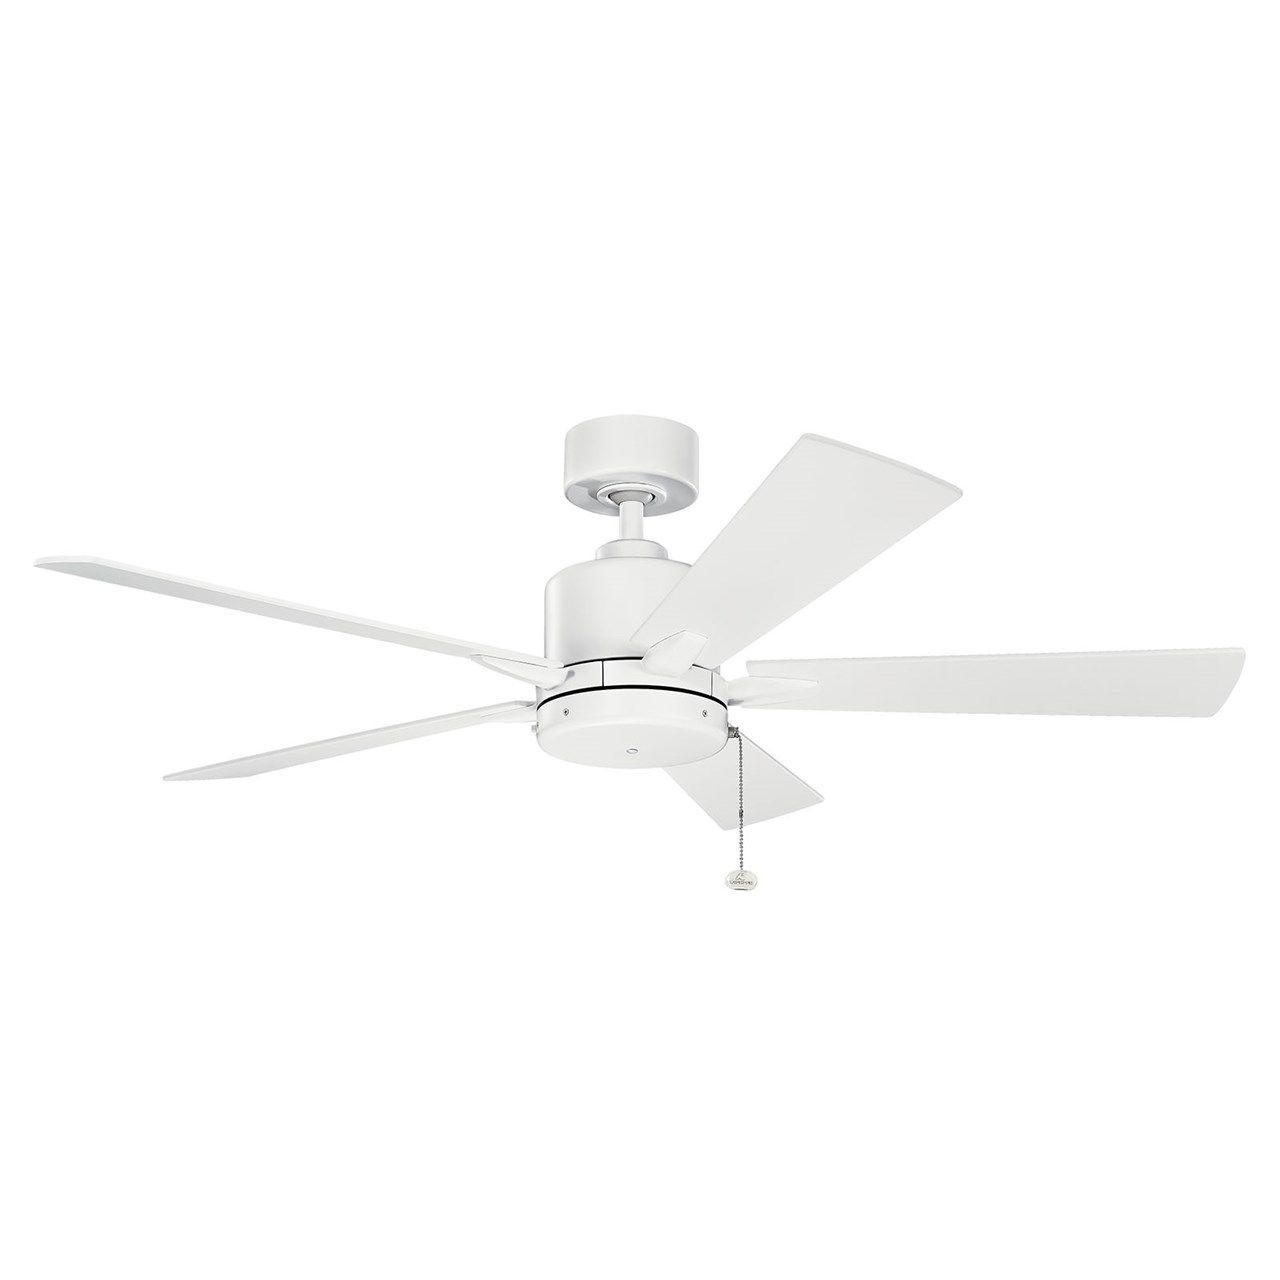 Bowen 52 Fan Matte White Kichler Lighting Ceiling Fans Without Lights Ceiling Fan White Ceiling Fan